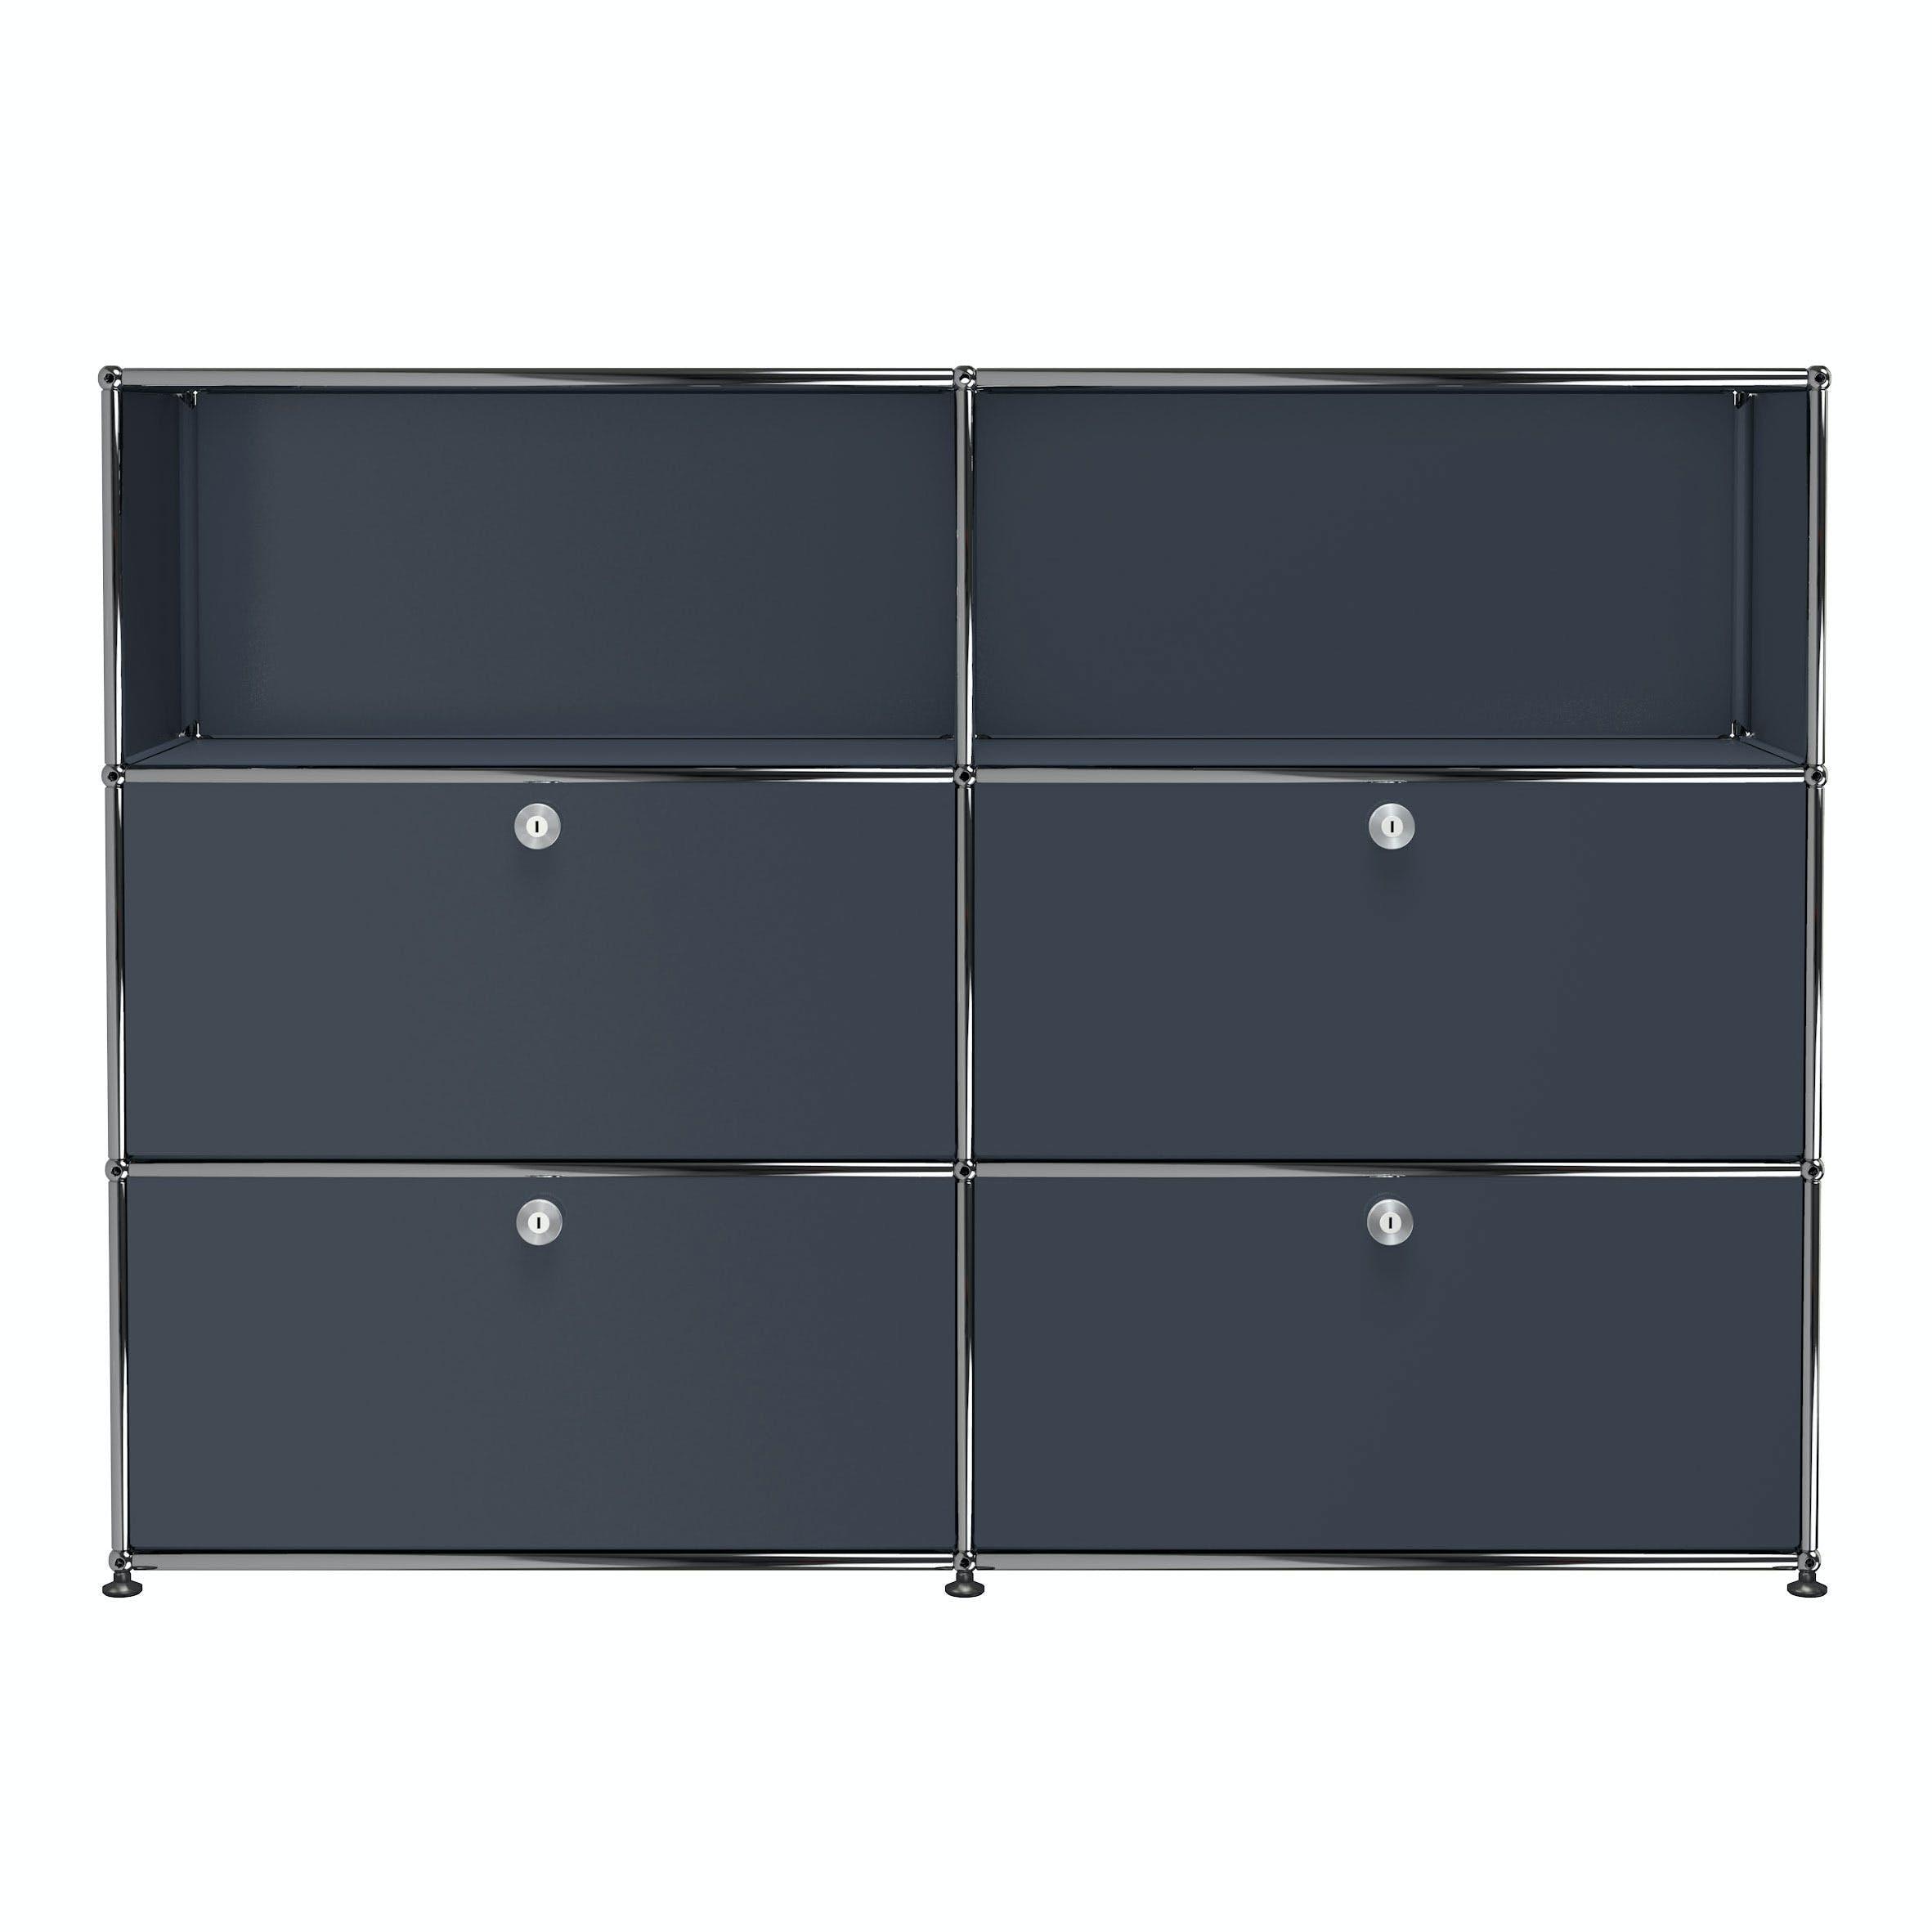 Usm-quick-shop-Haller-Storage-G2A-grey-haute-living